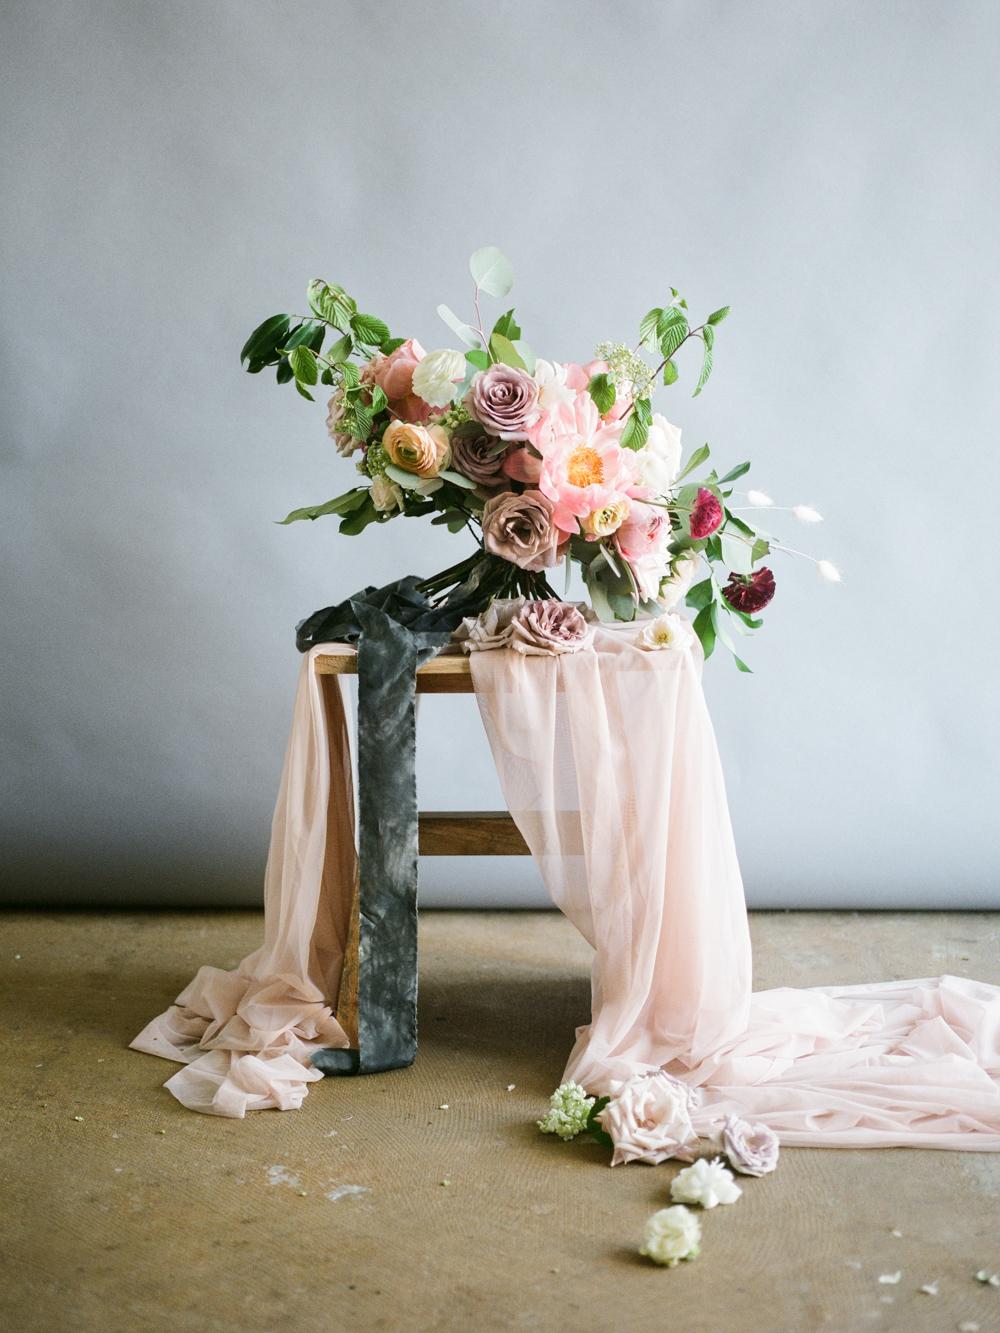 Christine Gosch - brand photographer - Maxit flower design - wedding florist-9.jpg